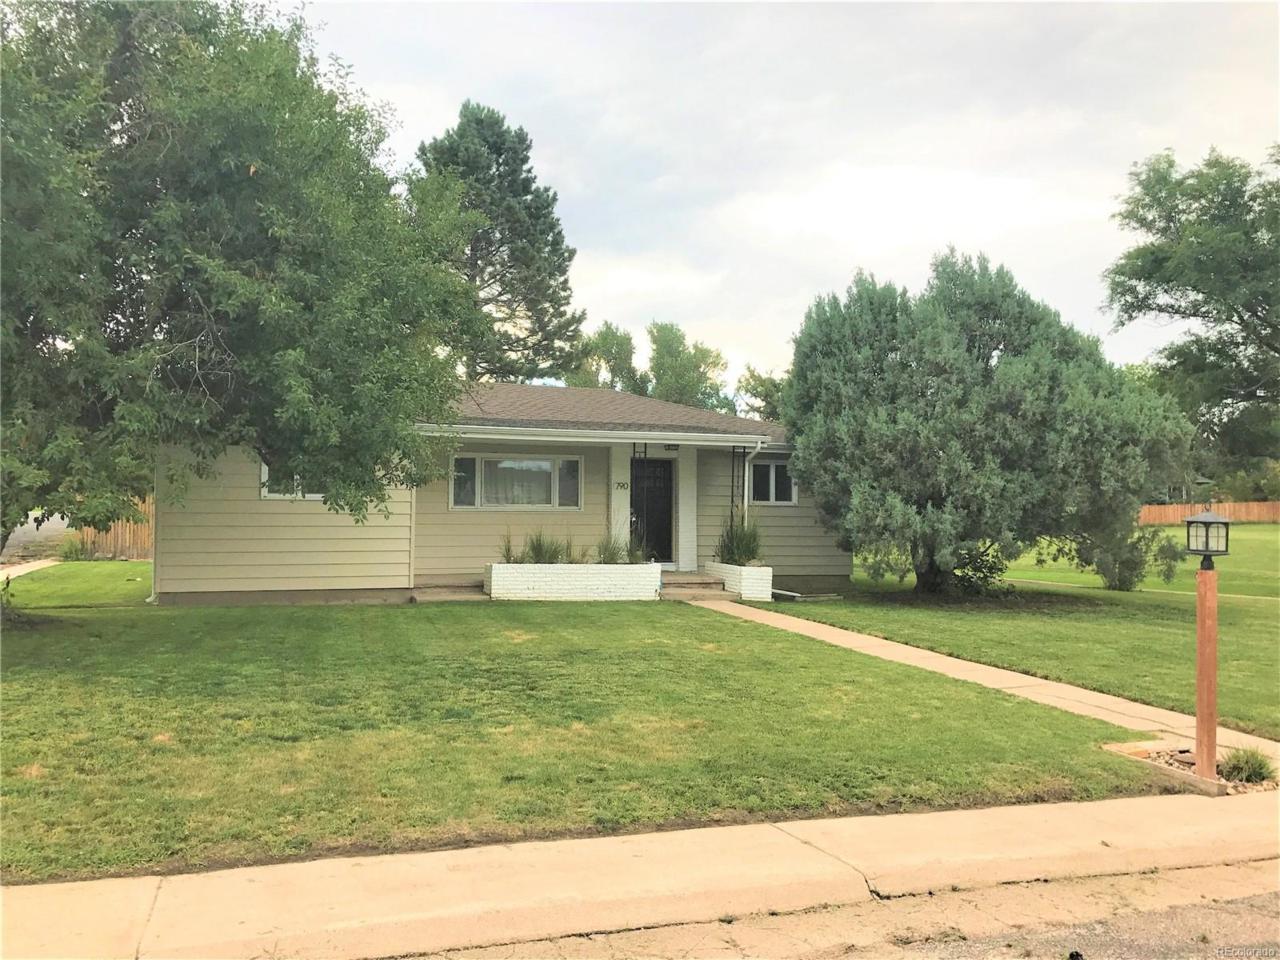 790 Hillcrest Drive, Limon, CO 80828 (MLS #8605097) :: 8z Real Estate